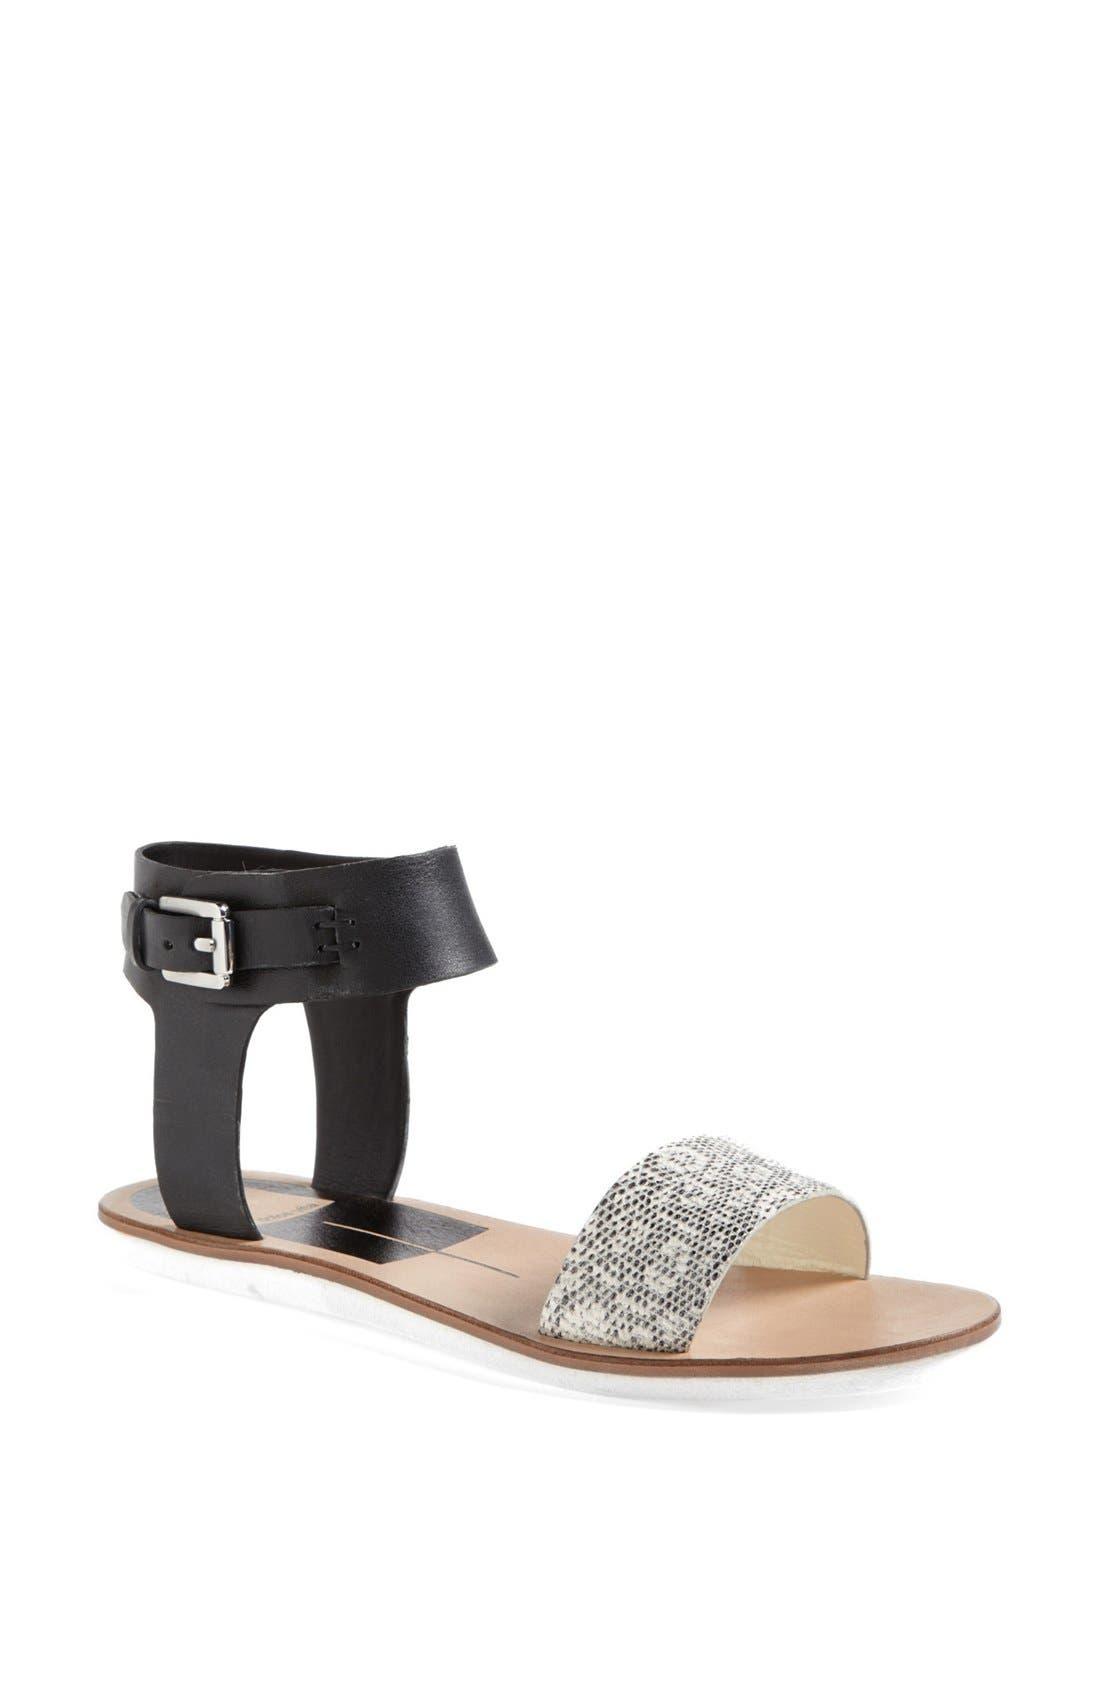 Main Image - Dolce Vita 'Naria' Sandal